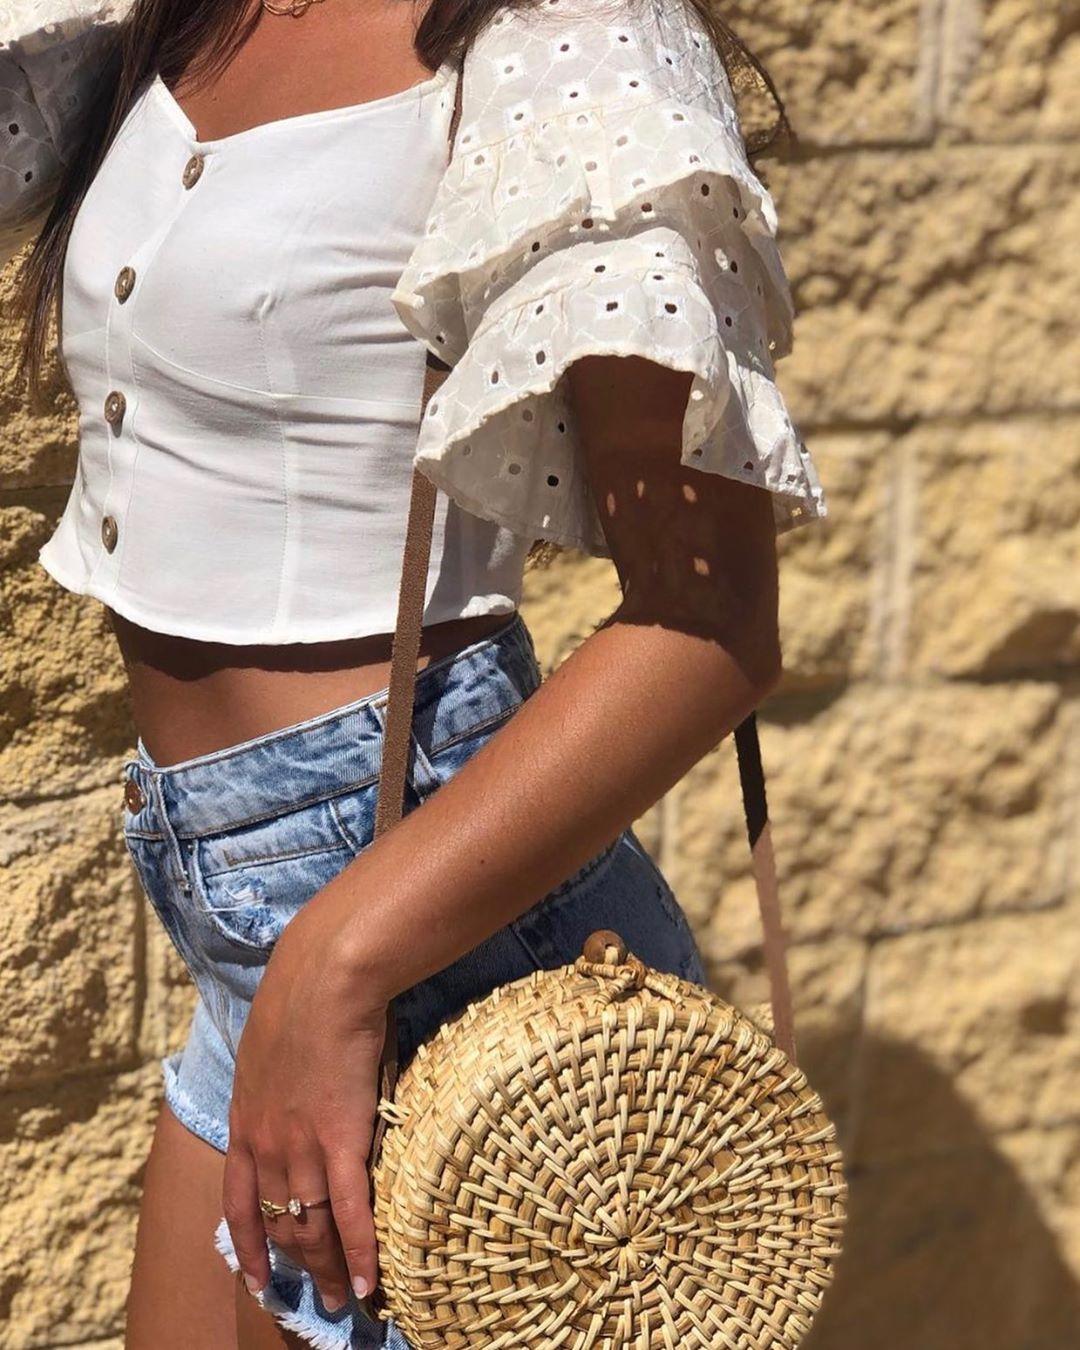 short top with ruffle sleeves de Zara sur lor_rodriguez